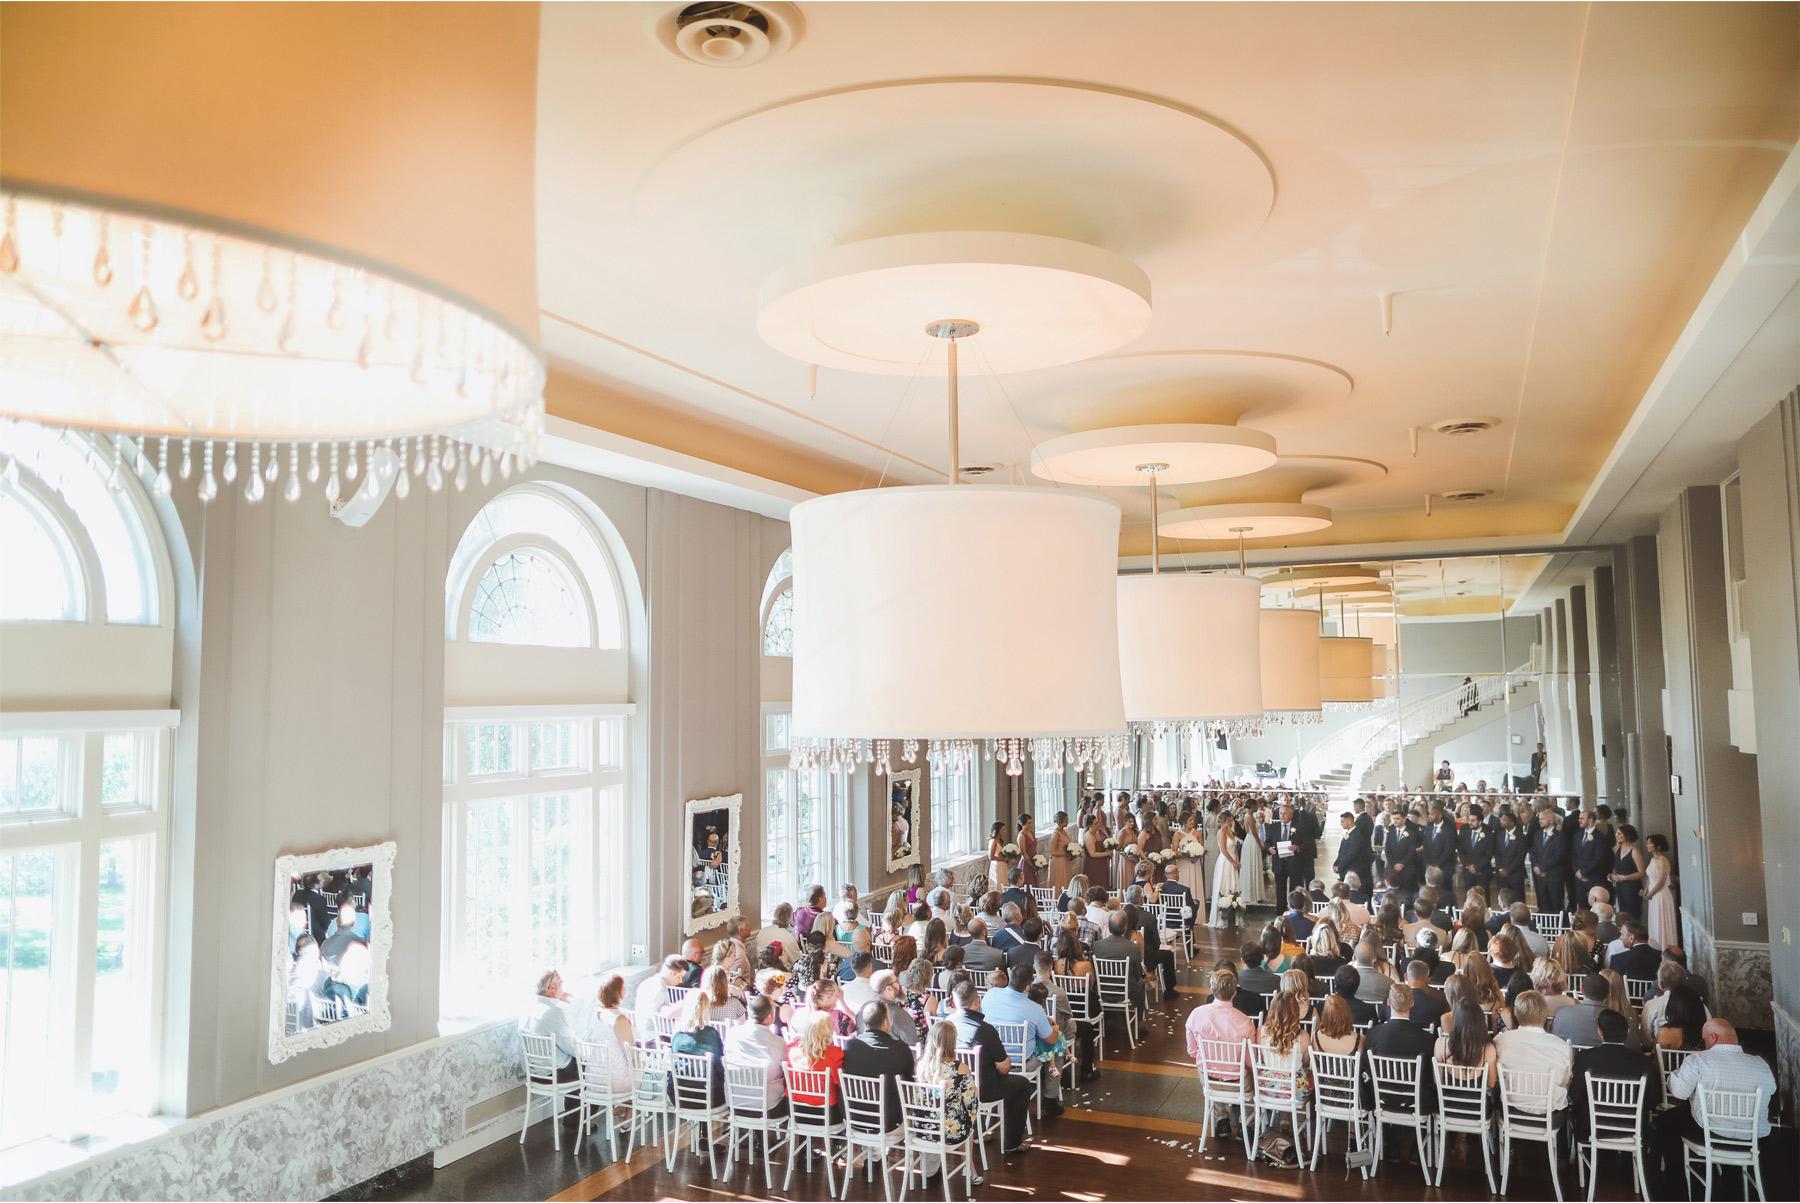 13-Minneapolis-Minnesota-Wedding-Andrew-Vick-Photography-Calhoun-Beach-Club-Ceremony-Samantha-and-Ryan.jpg